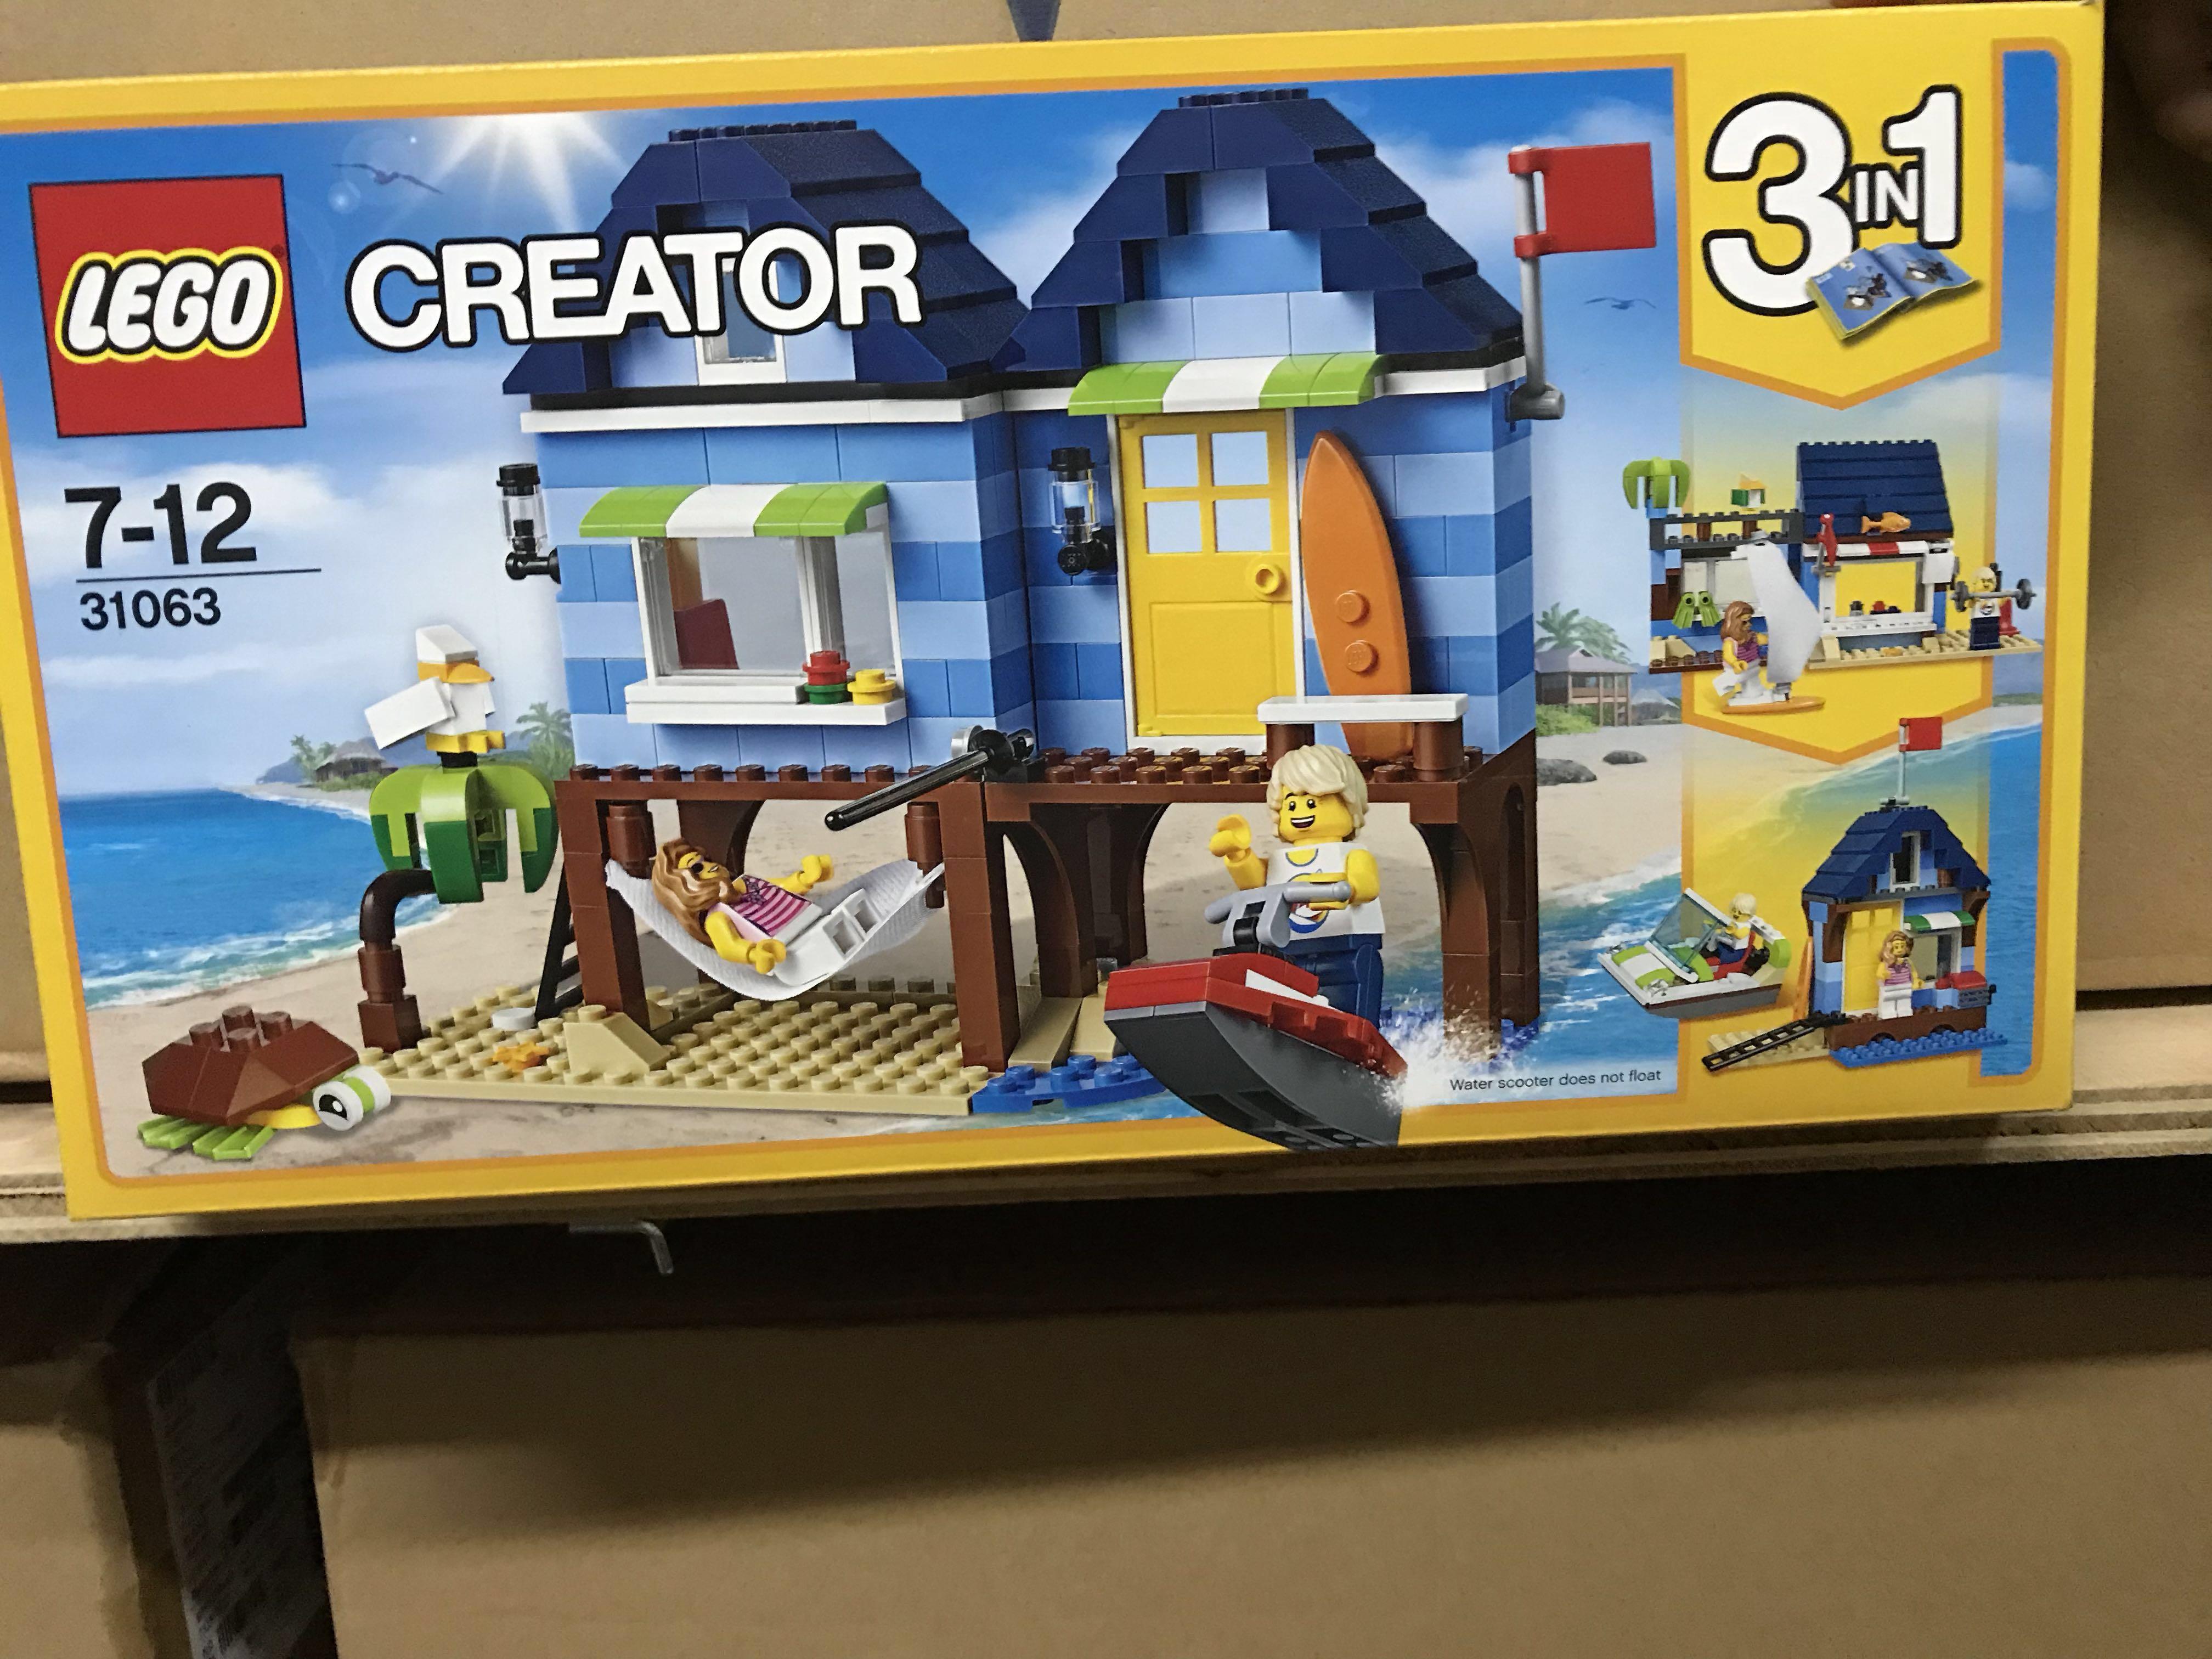 Tempat Jual Ferrari F1 Racers 8123 Terbaru 2018 Bonia Elegant Bnb10099 1127 Jam Tangan Pria Silver Gold Lego Creator 31063 Beach House Toys Games Bricks Figurines On Carousell